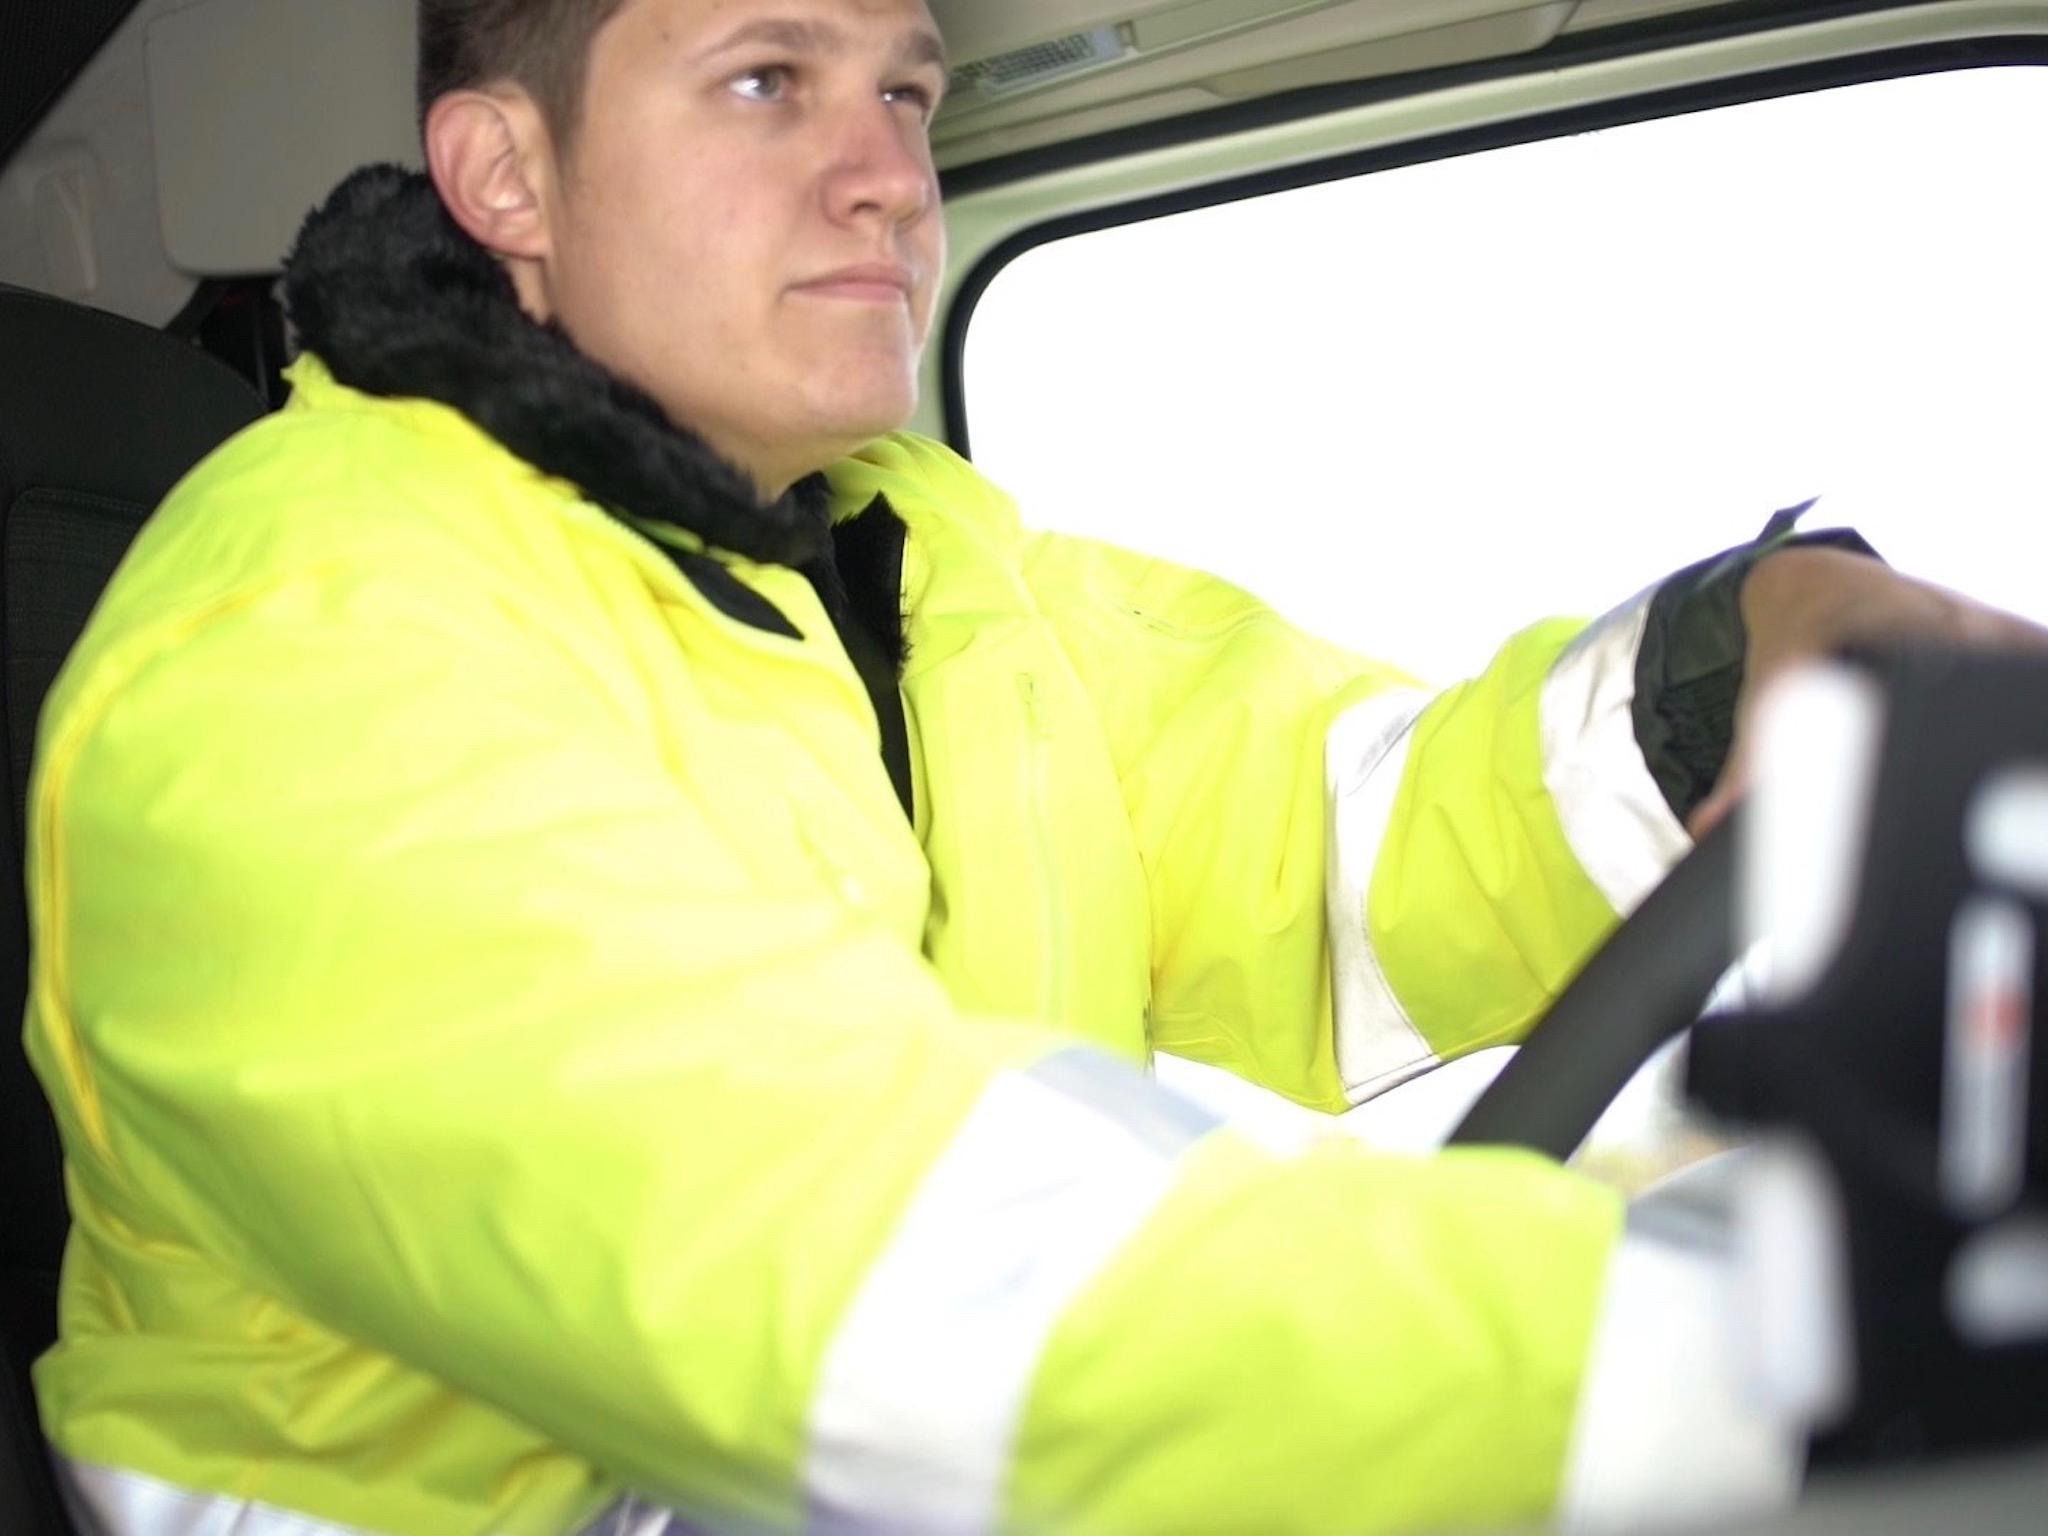 Kraftfahrzeuge steuern ist anspruchsvoll. Foto: Pabst Transport